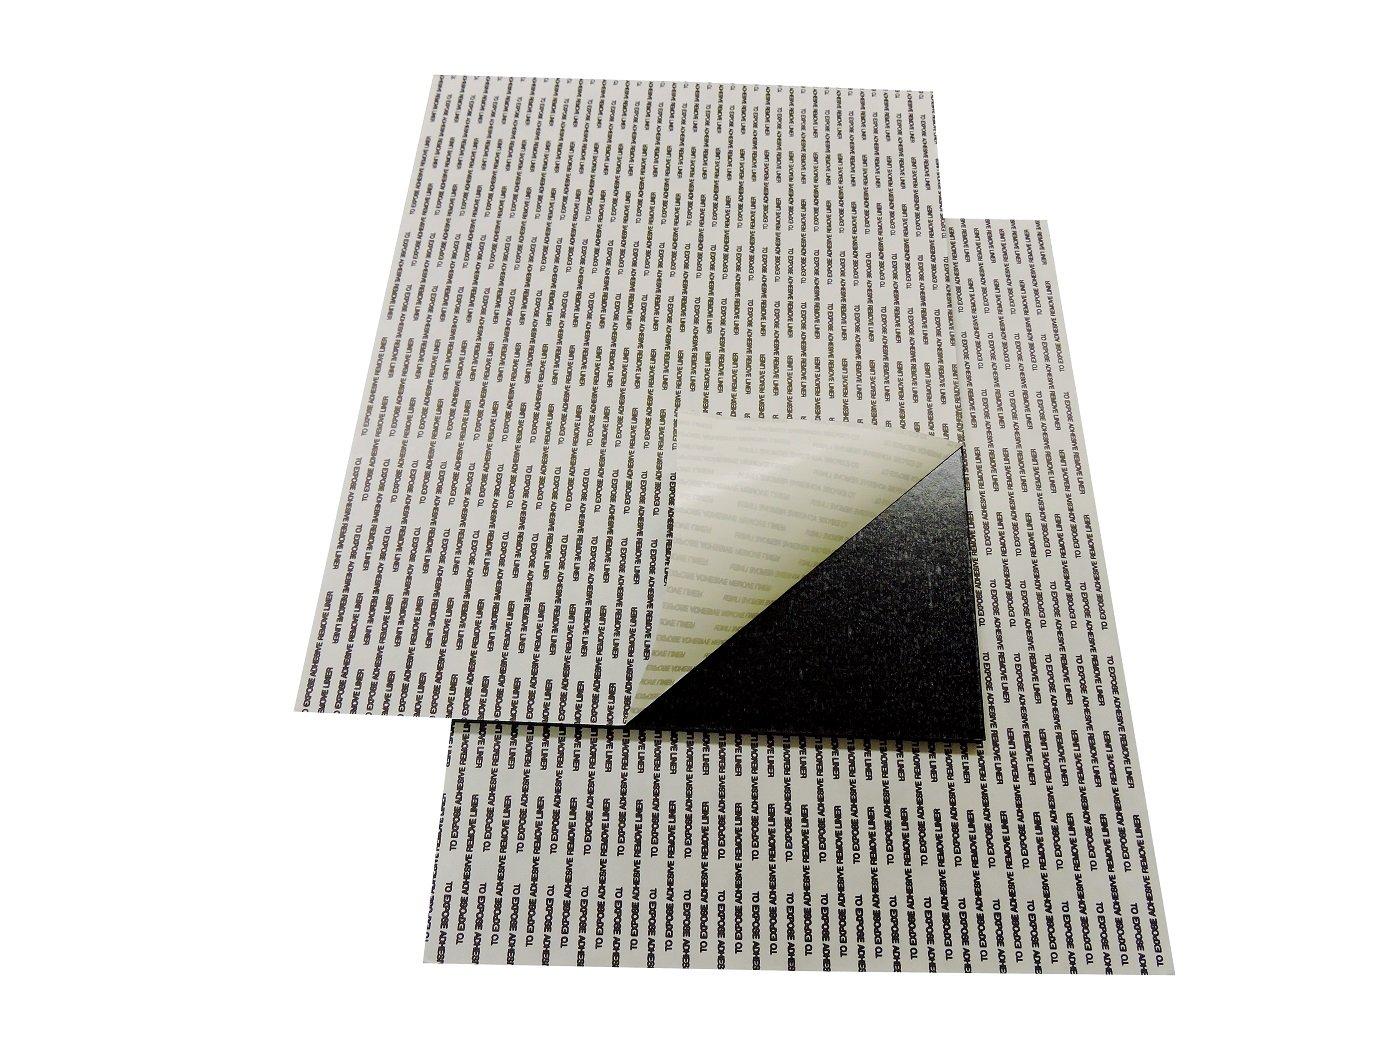 Self-Stick Adhesive Black Foam Boards 24''x36'' (10)